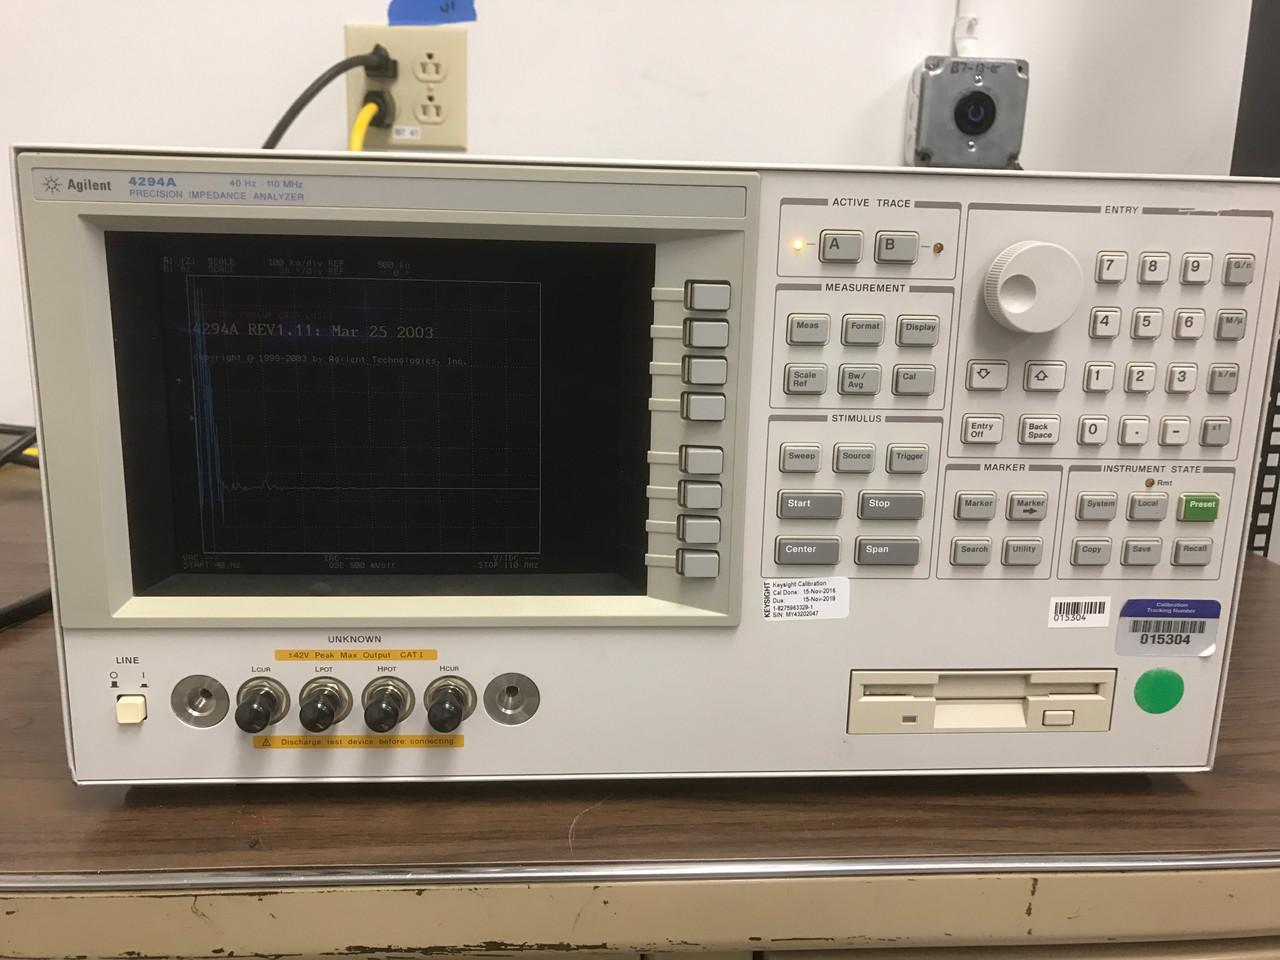 Agilent 4294A 40 Hz - 110 MHz, Impedance/Gain-Phase Analyzer, cables, test fixture, software